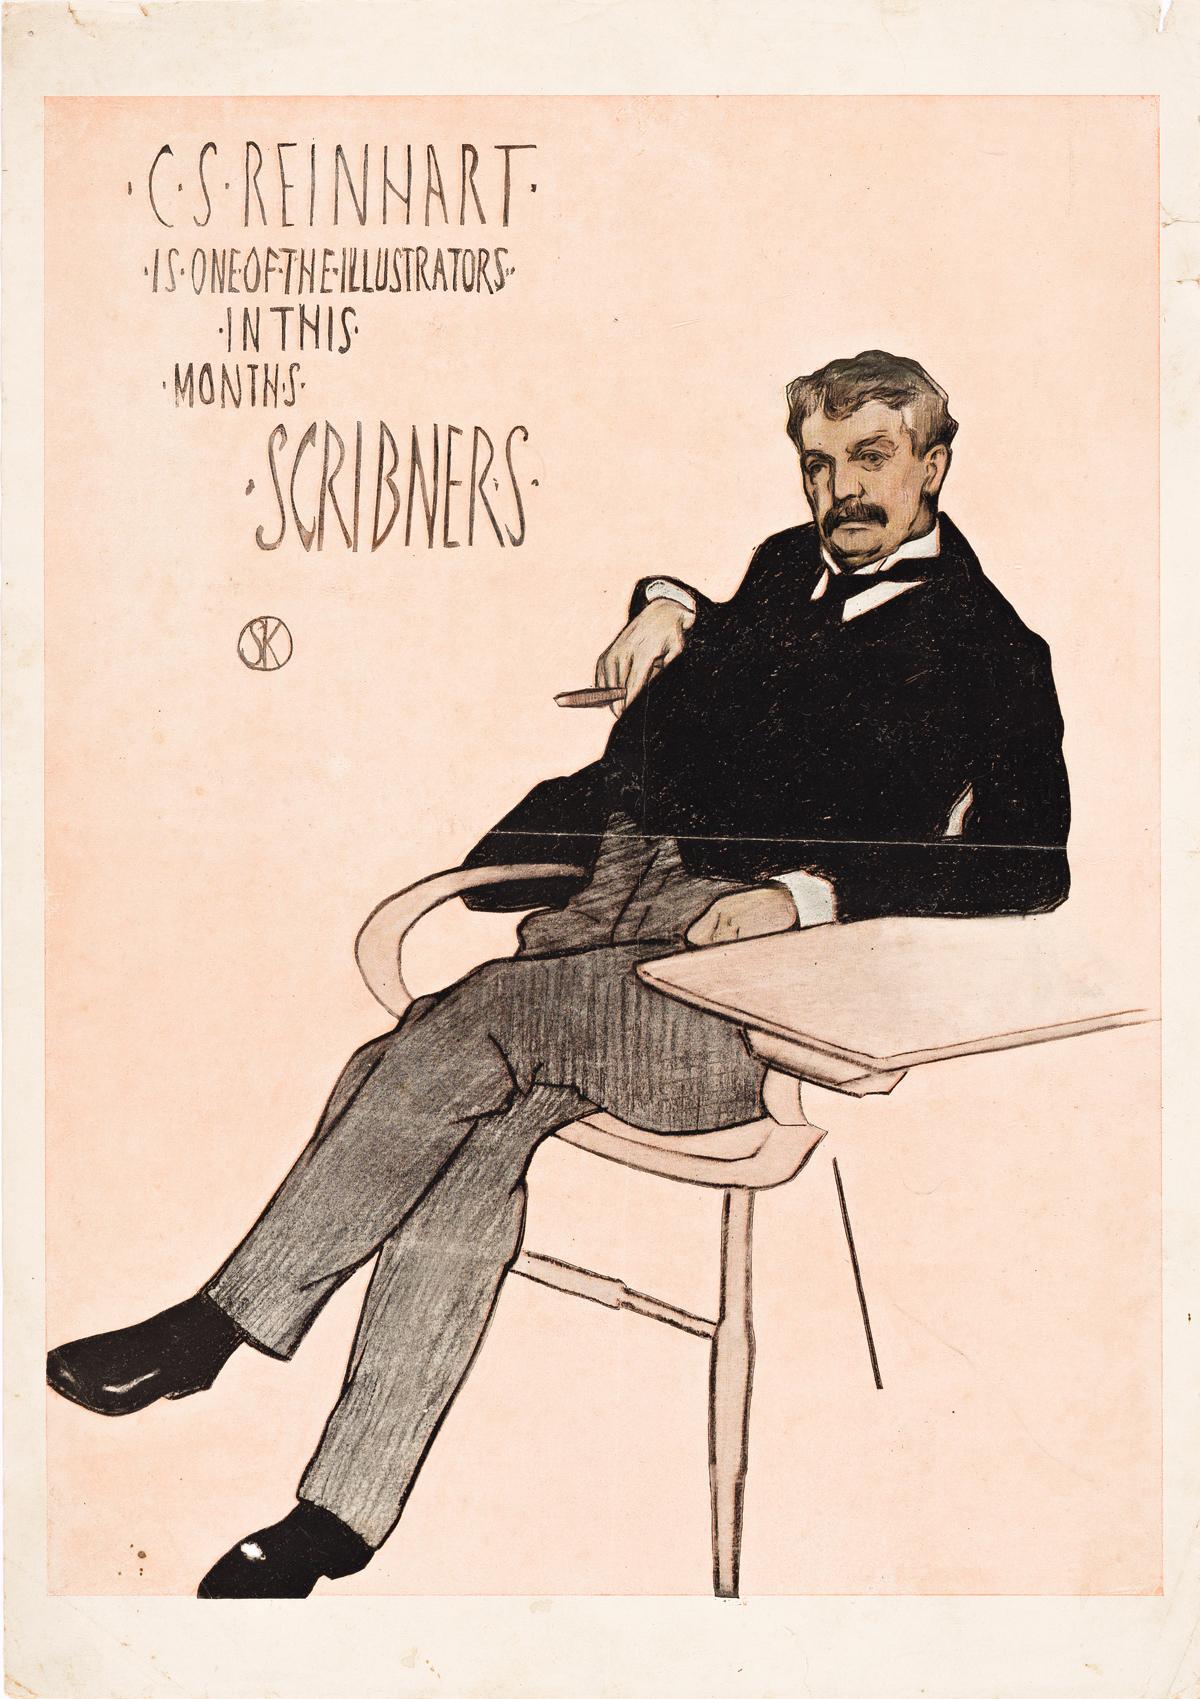 WILLIAM SERGEANT KENDALL (1869-1938).  SCRIBNERS / C.S. REINHART. 1895. 17x12 inches, 44x31 cm.